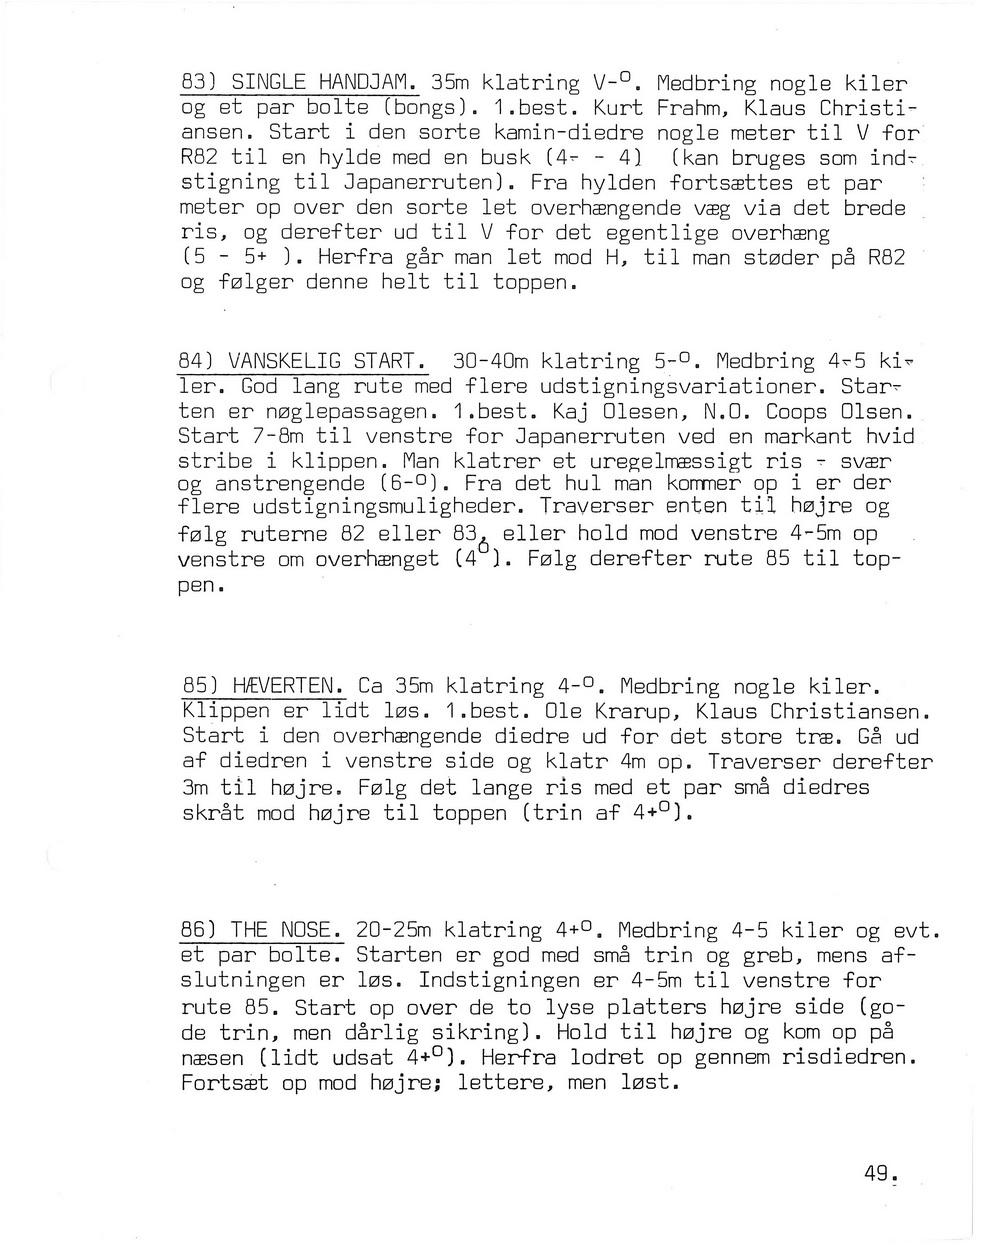 Kullen guide 1972 049.jpg